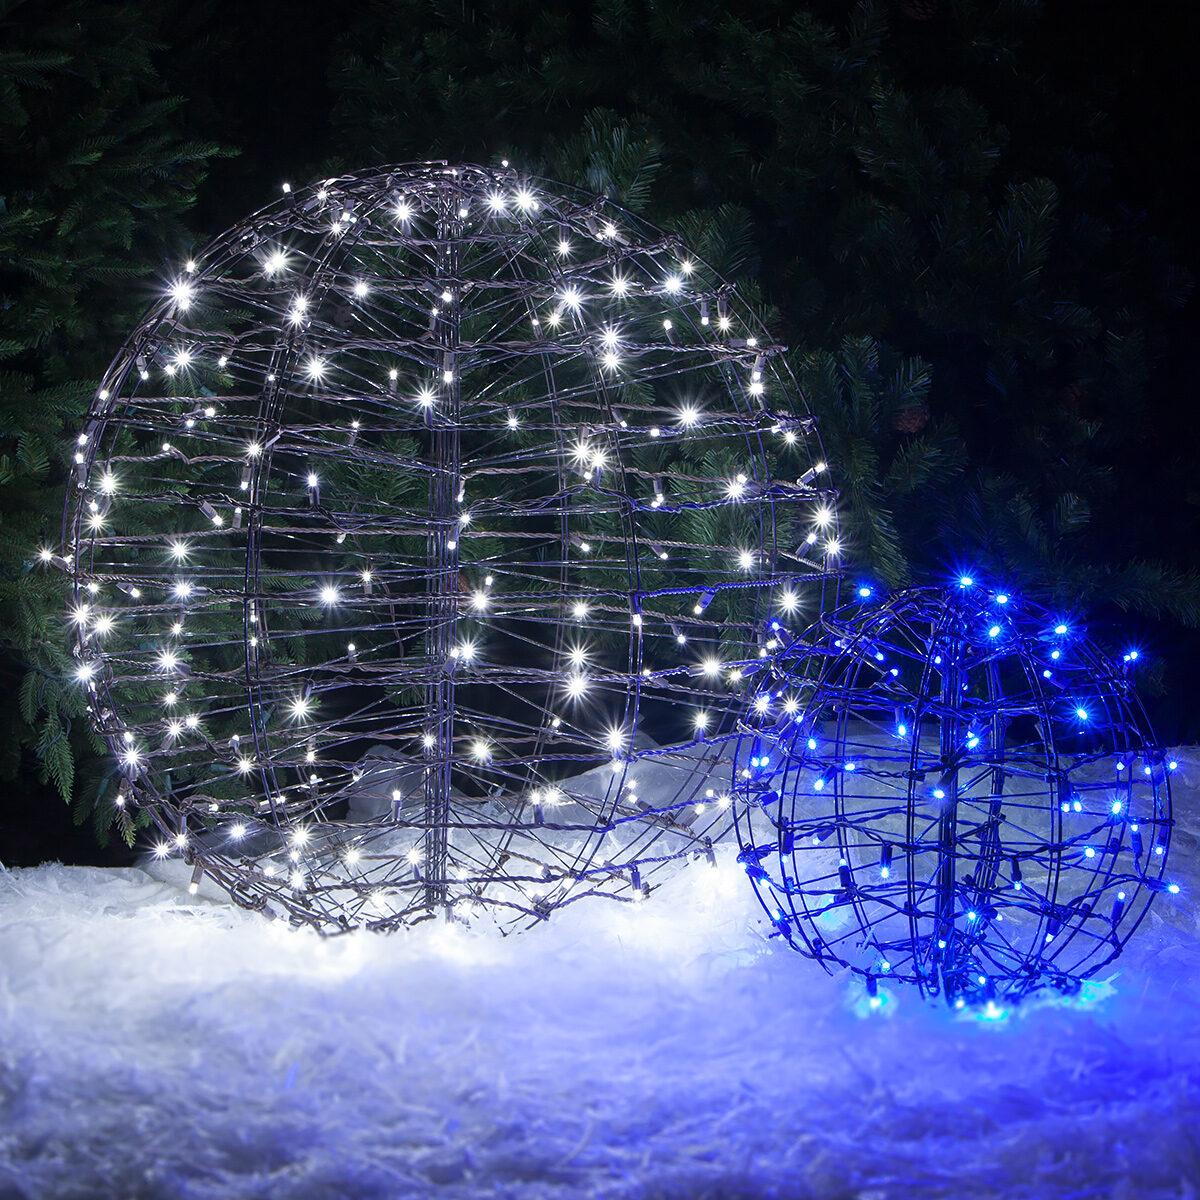 Outdoor Christmas Decorating Ideas - Yard Envy